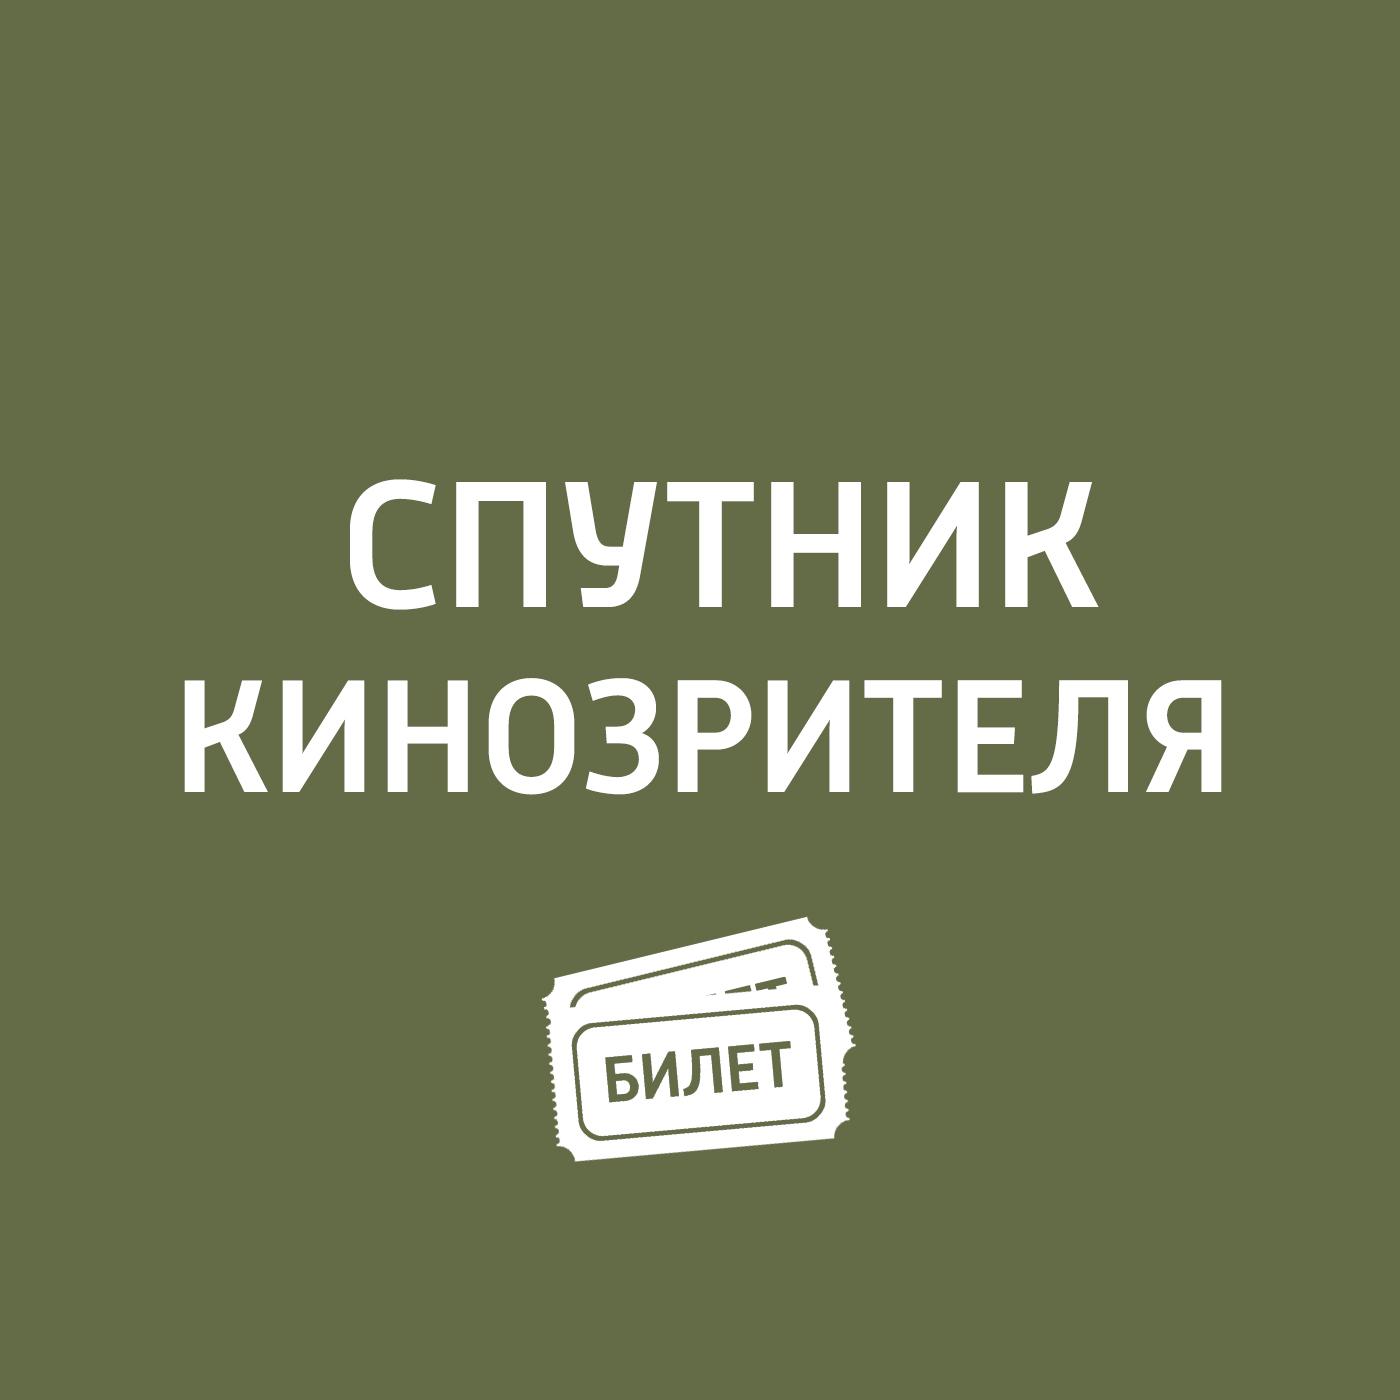 цена на Антон Долин Премьеры: «Ла-Ла Ленд», «Закон ночи», «По Млечному Пути»